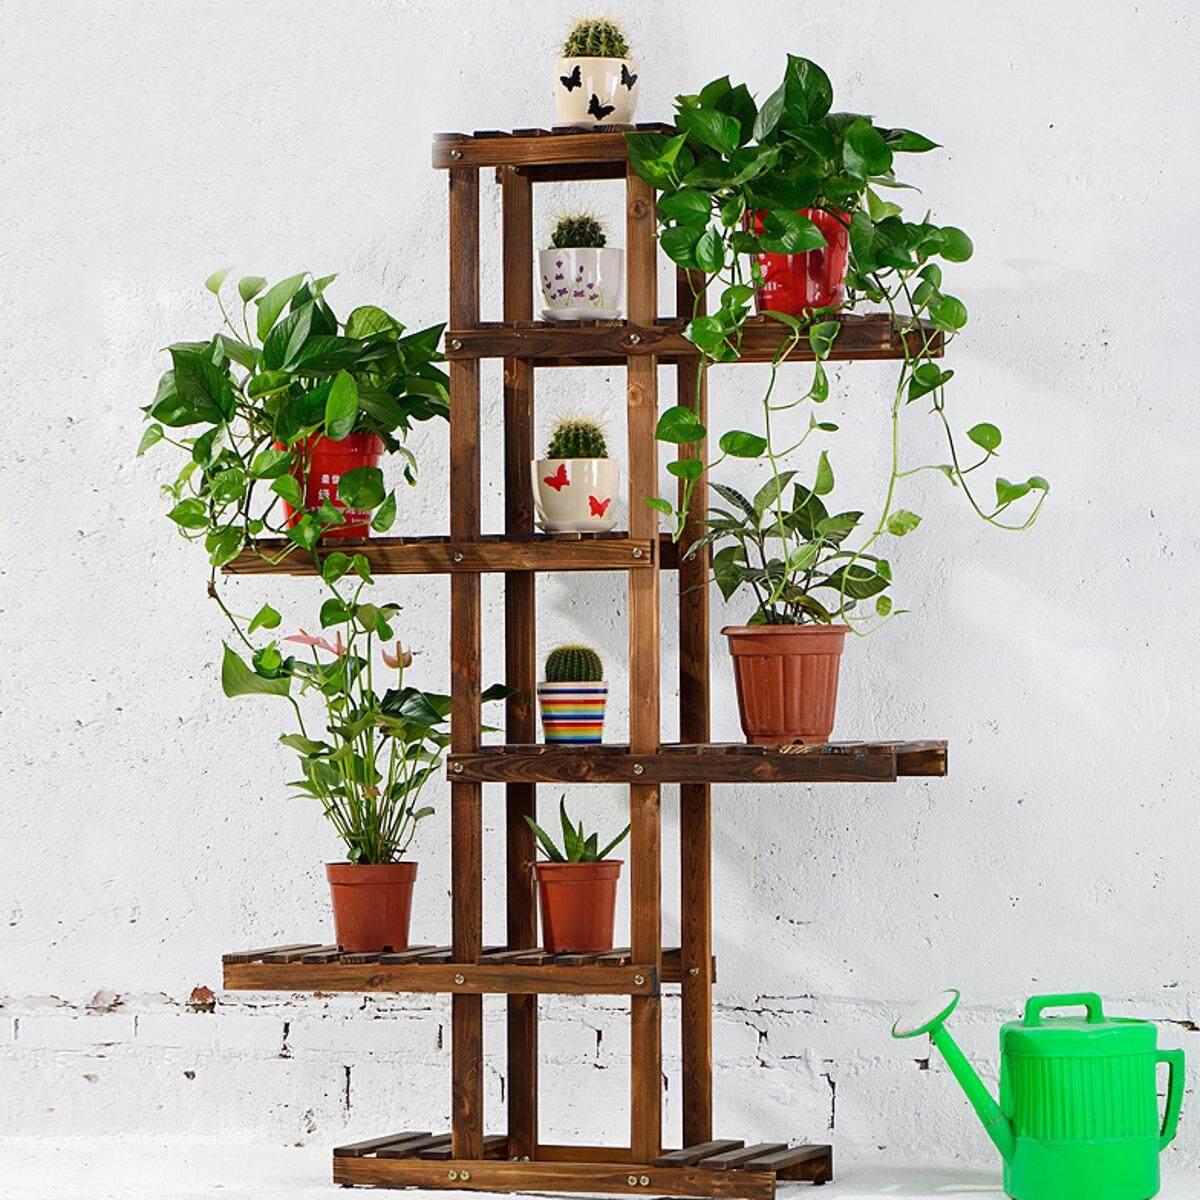 Bamboo Wooden Plant Stand Indoor Outdoor Garden Planter Flower Pot Stand Shelf - intl